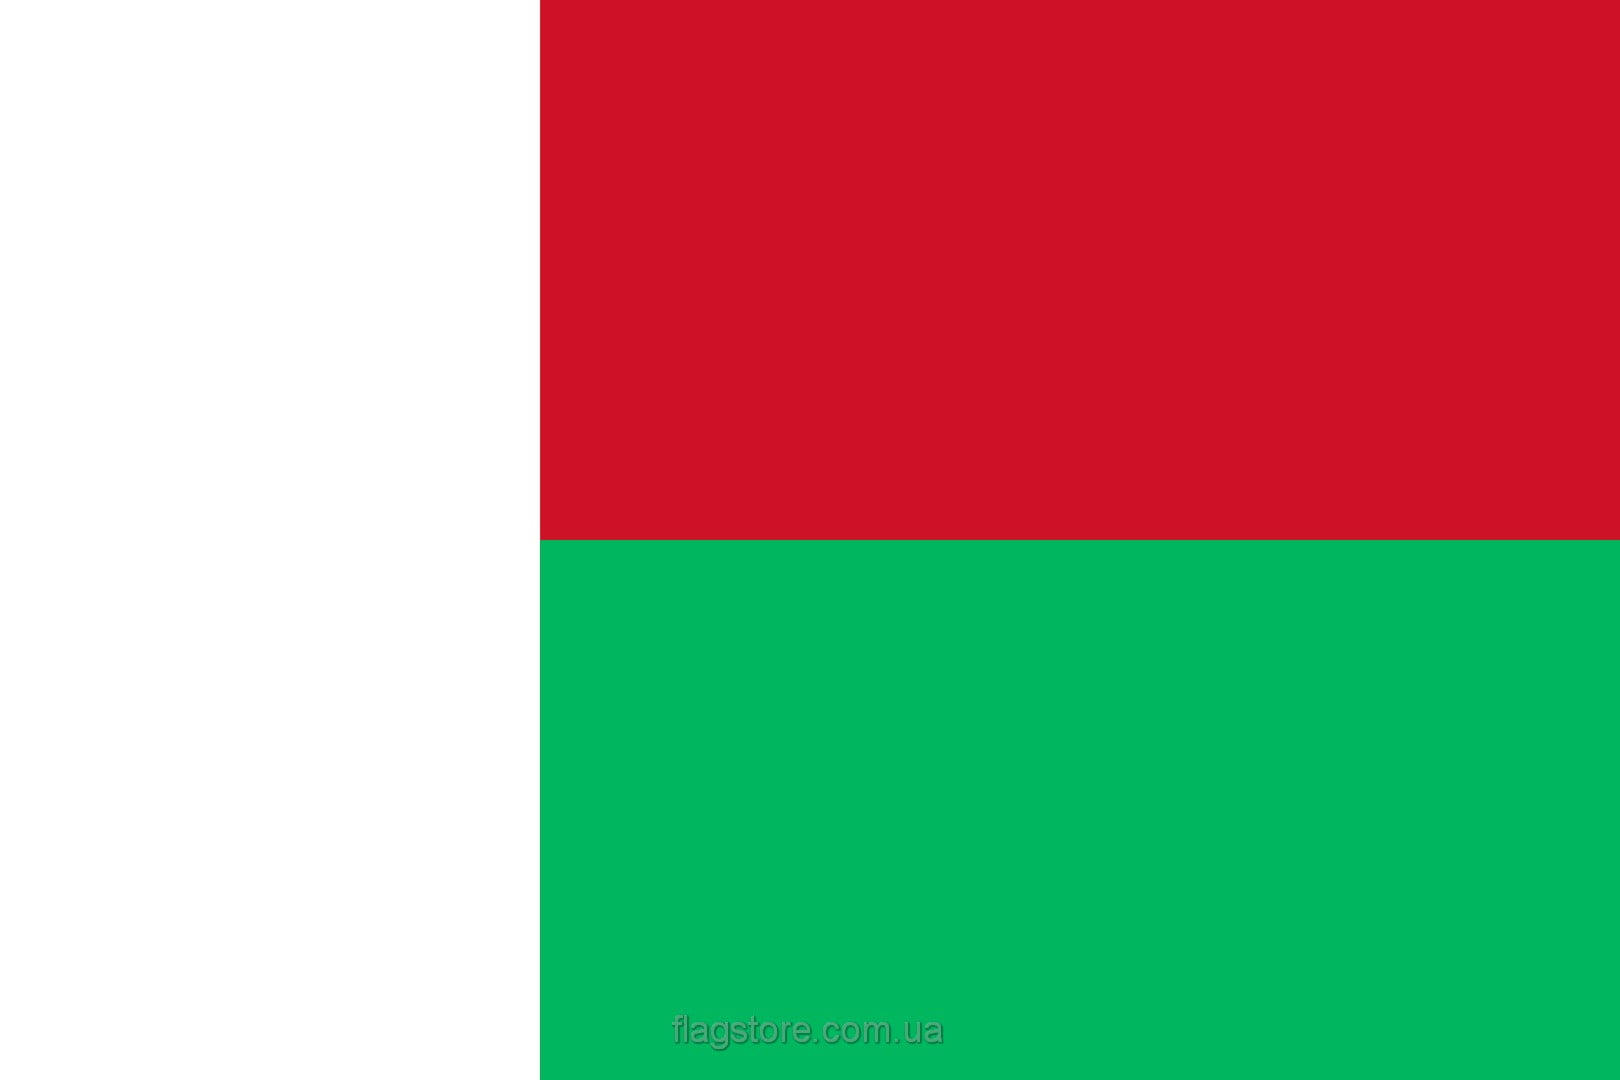 Купить флаг Мадагаскара (страны Мадагаскар)